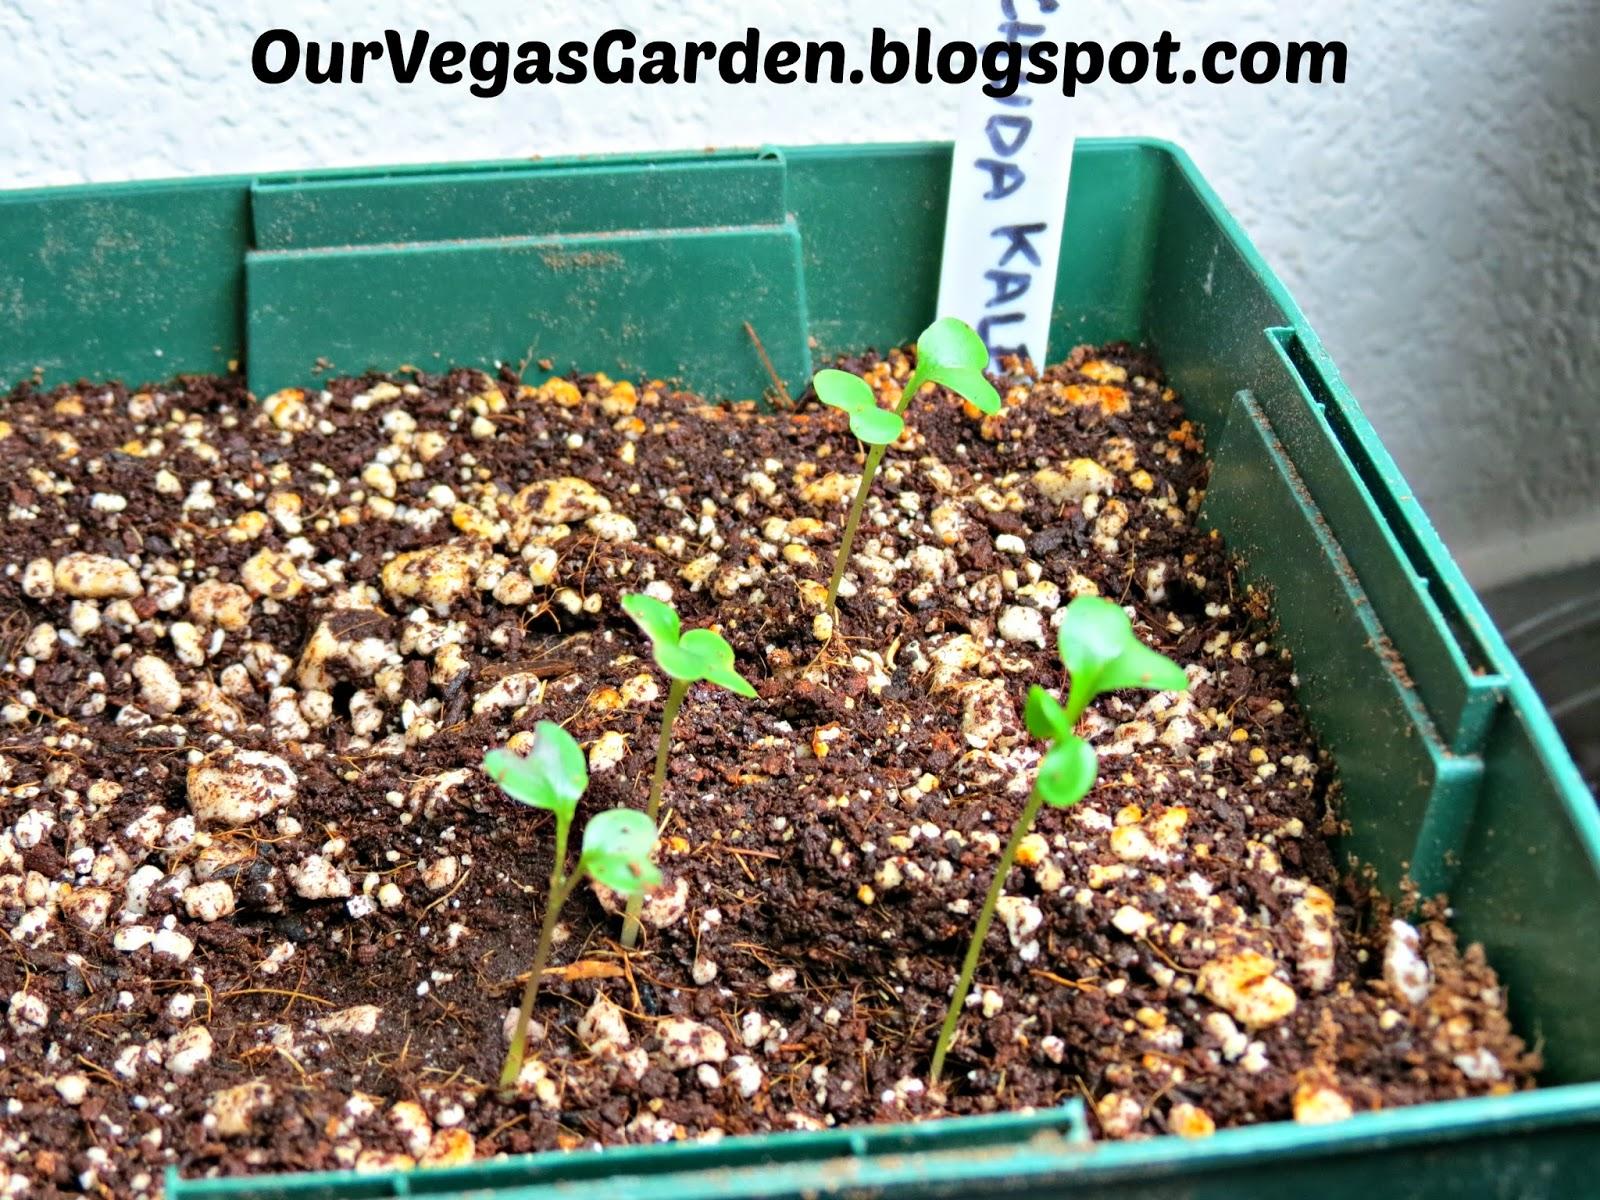 desert organic farming organic indoor garden potted plants end